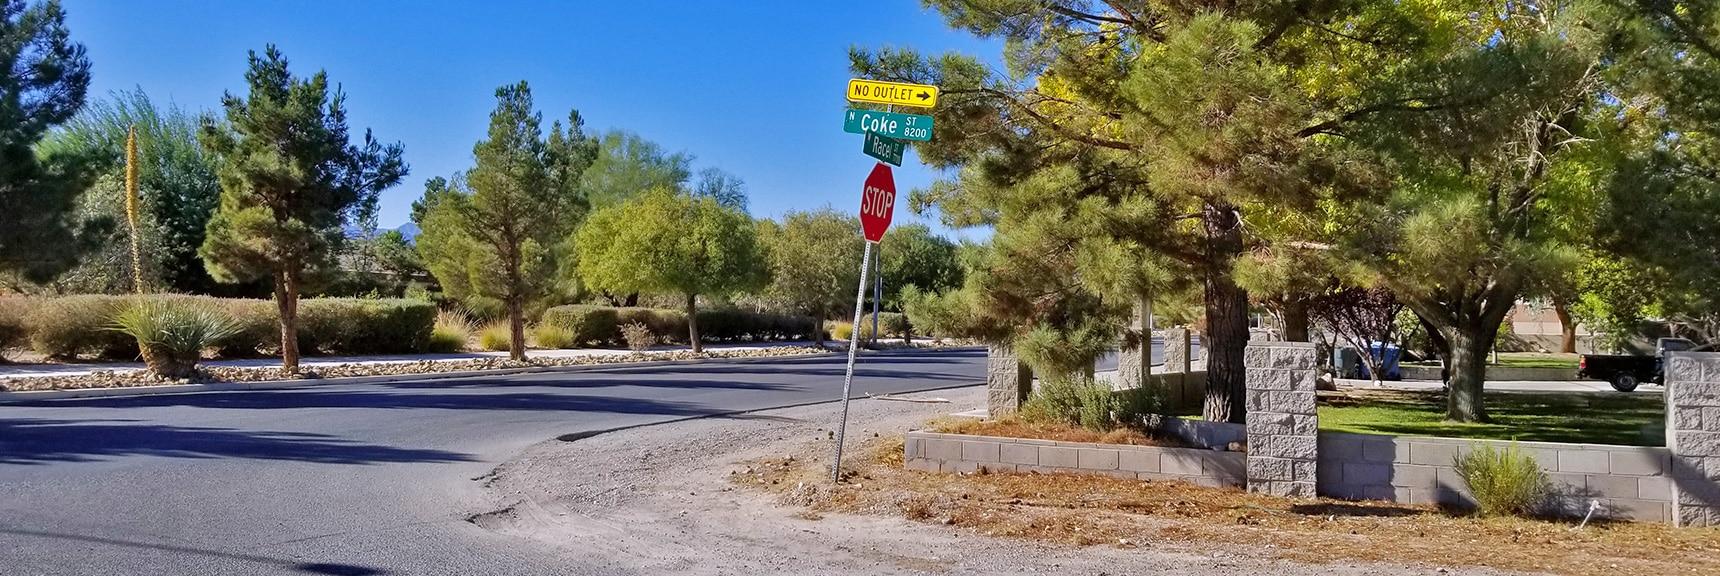 Right Turn North Onto Coke Street from Rachel   Centennial Hills Mountain Bike Conditioning Adventure Loop, Las Vegas, Nevada